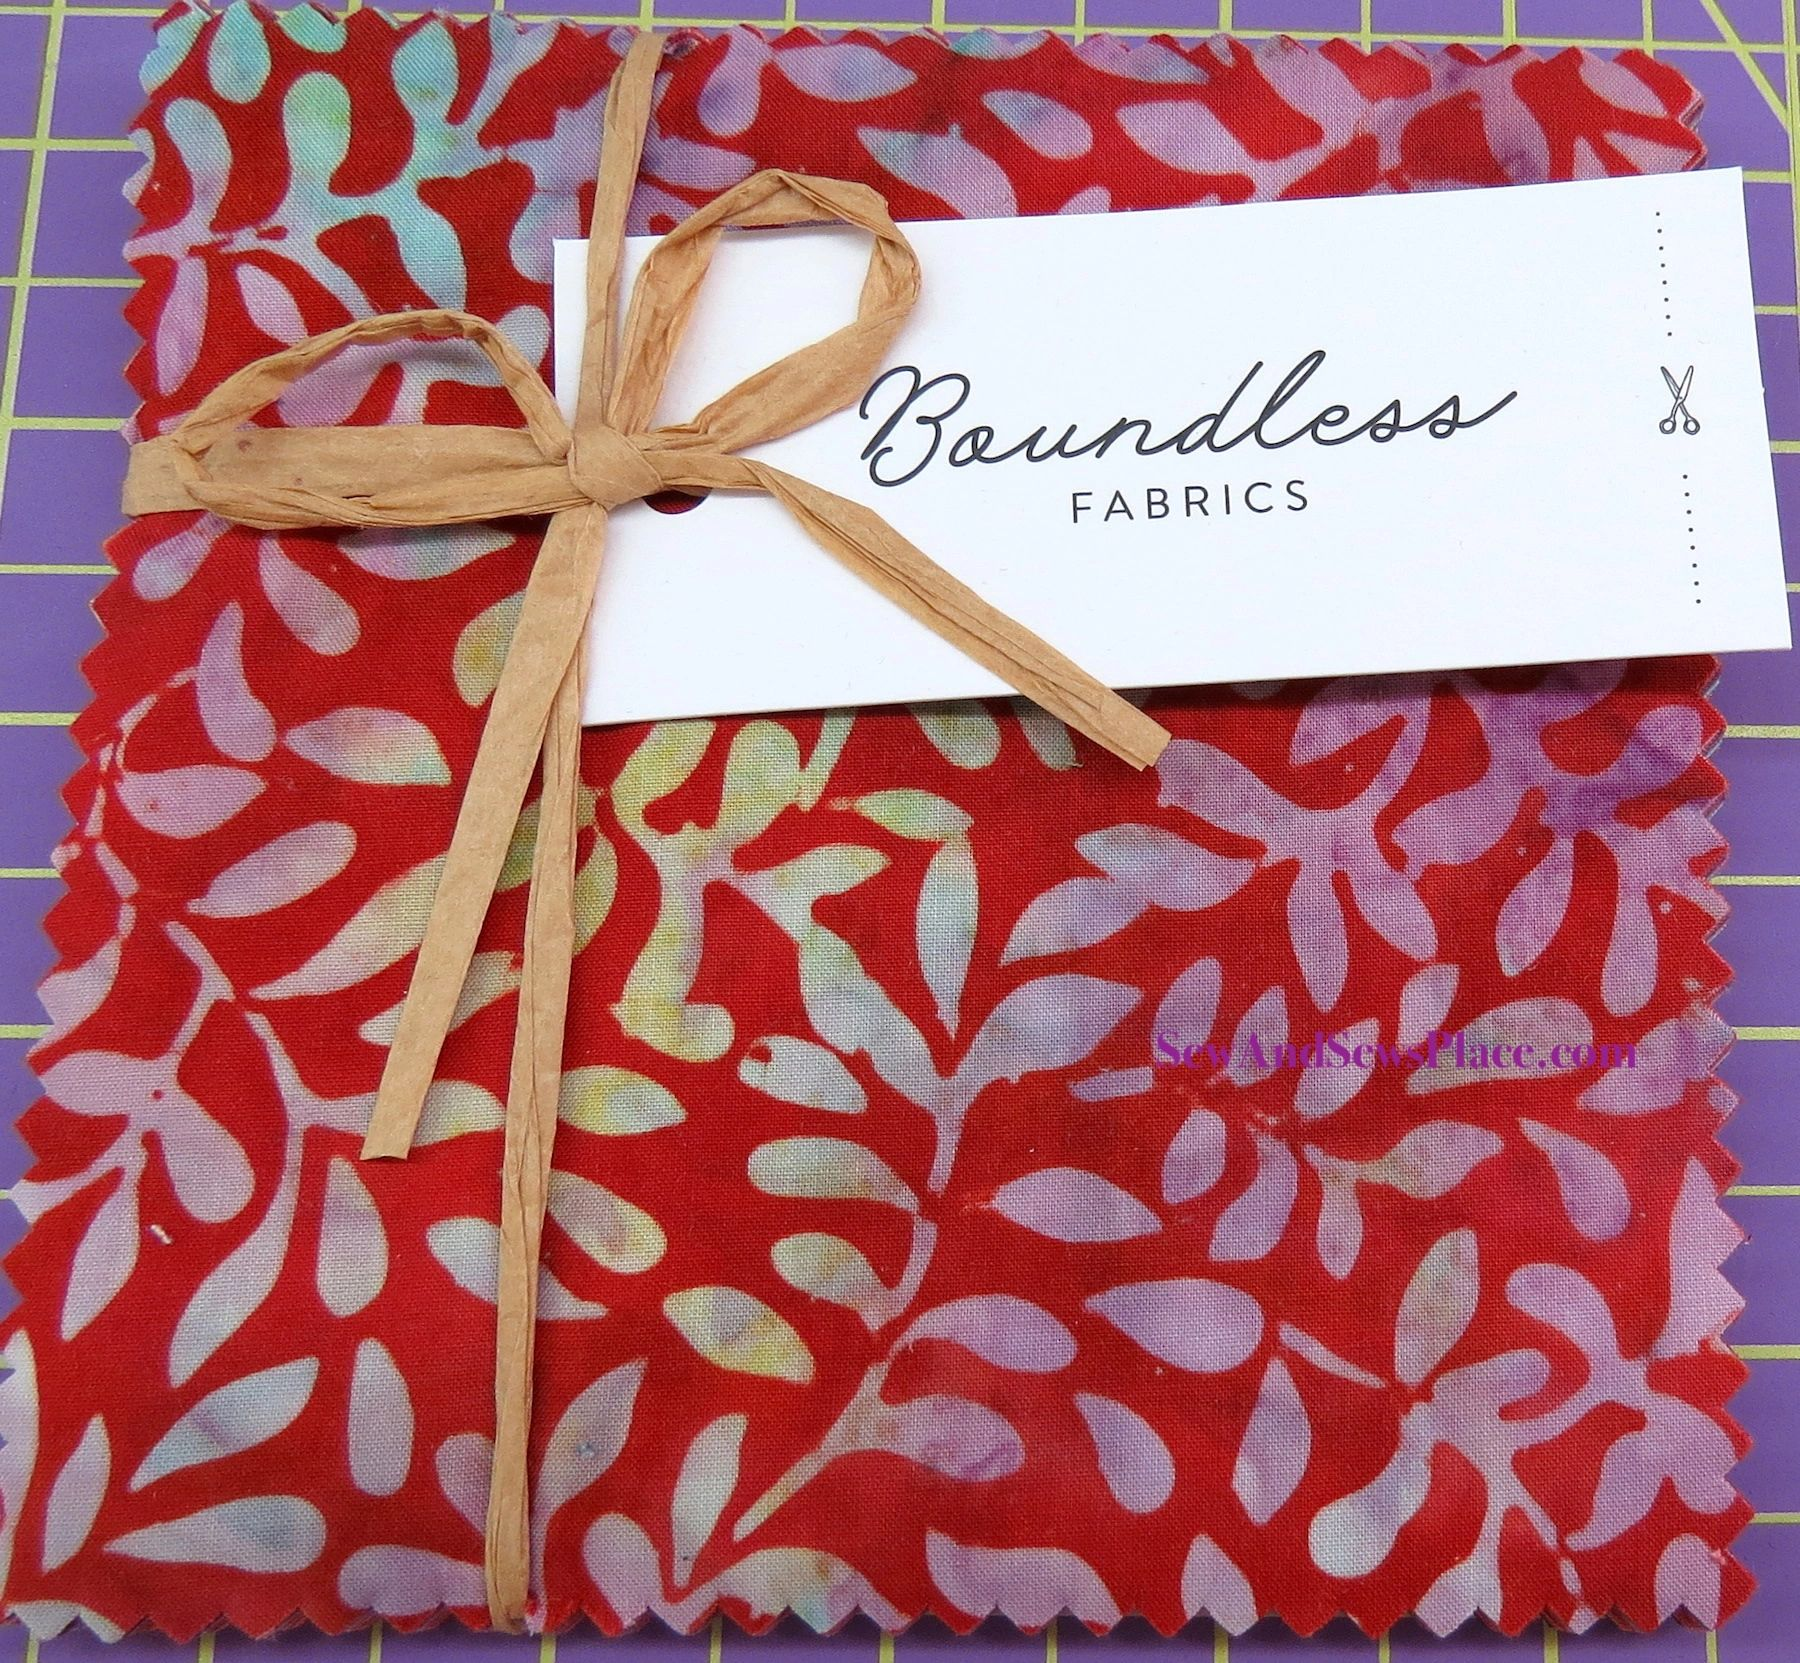 5 Pre-Cut Spark Charm Squares by Boundless Fabrics Batik Multi Colored